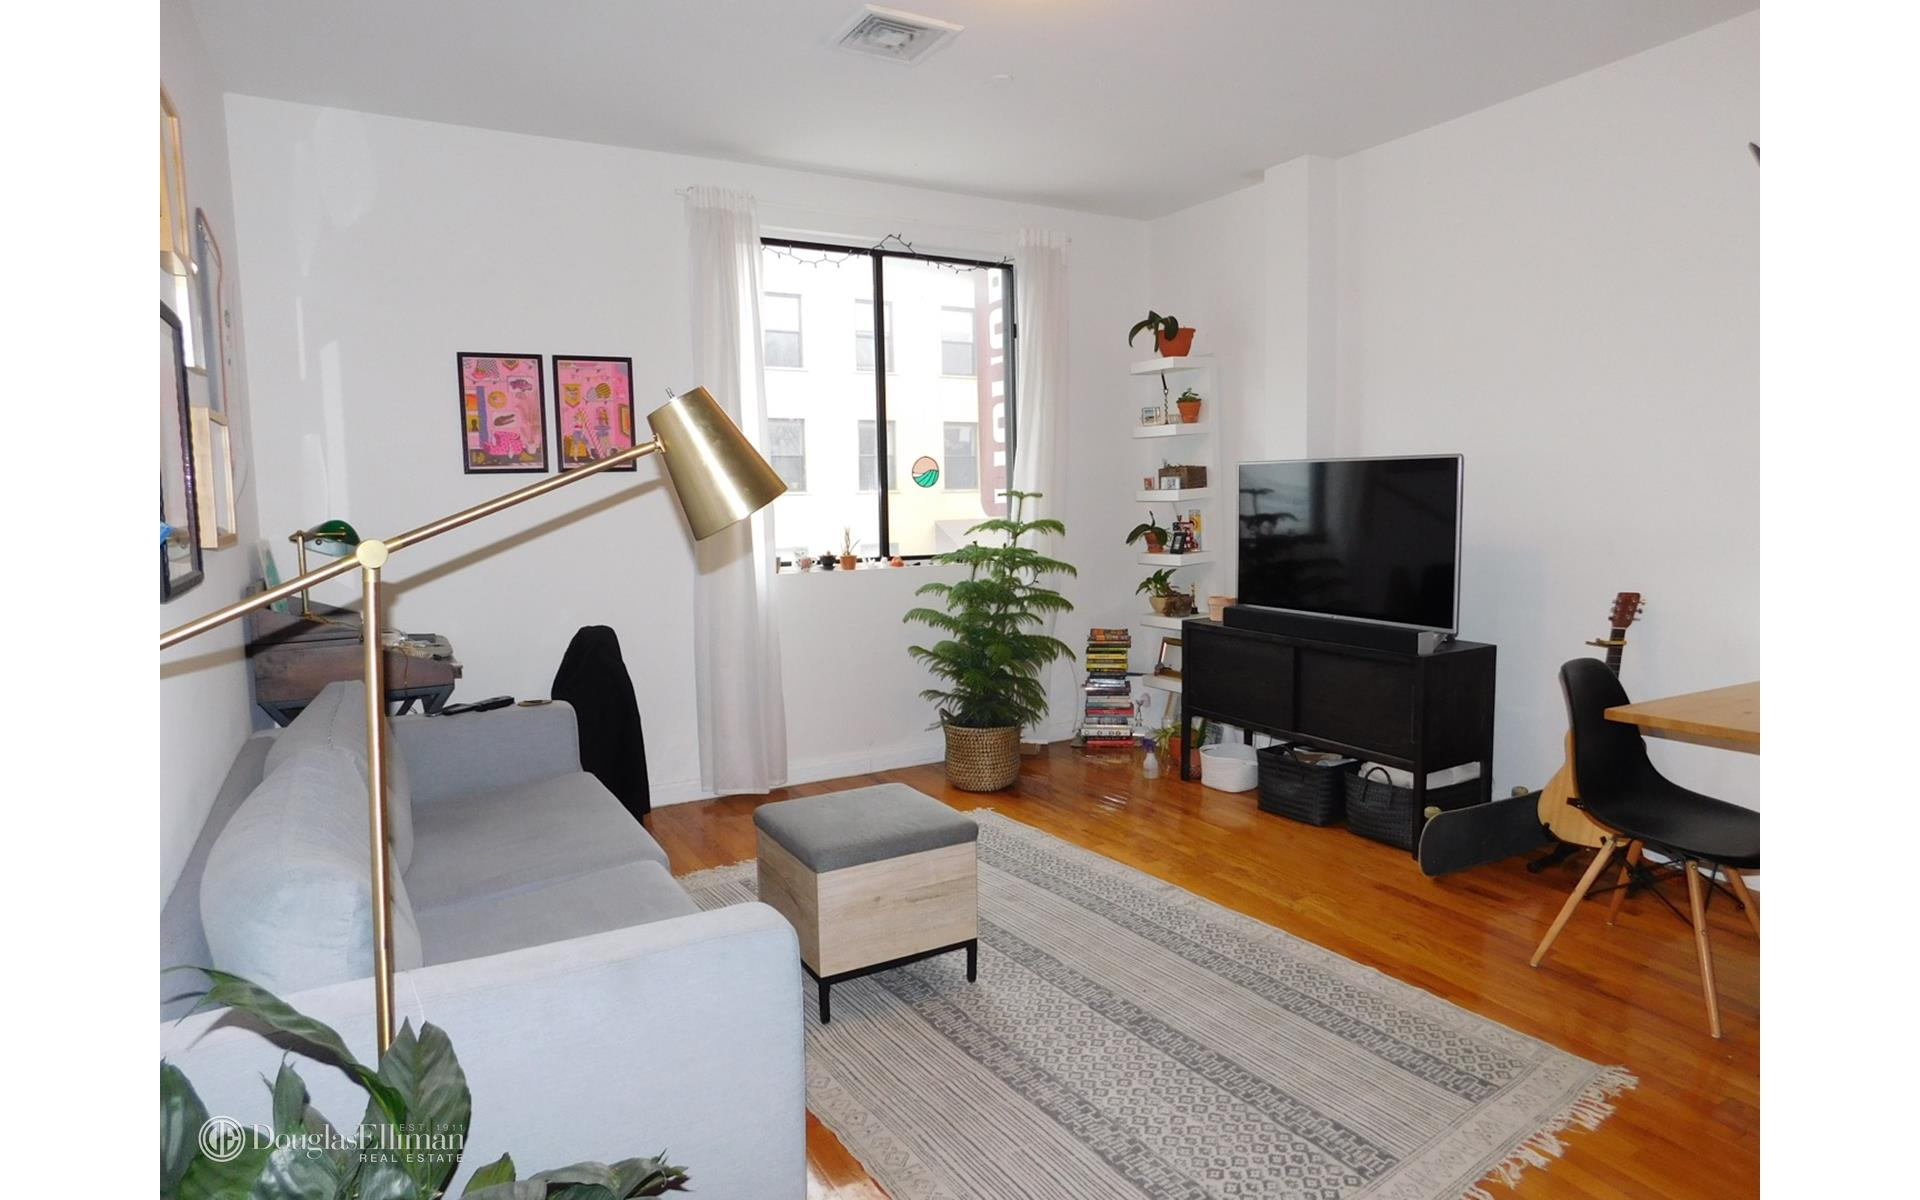 Williamsburg 1 bedroom rental at 494 lorimer st brooklyn - 1 bedroom apartments williamsburg brooklyn ...